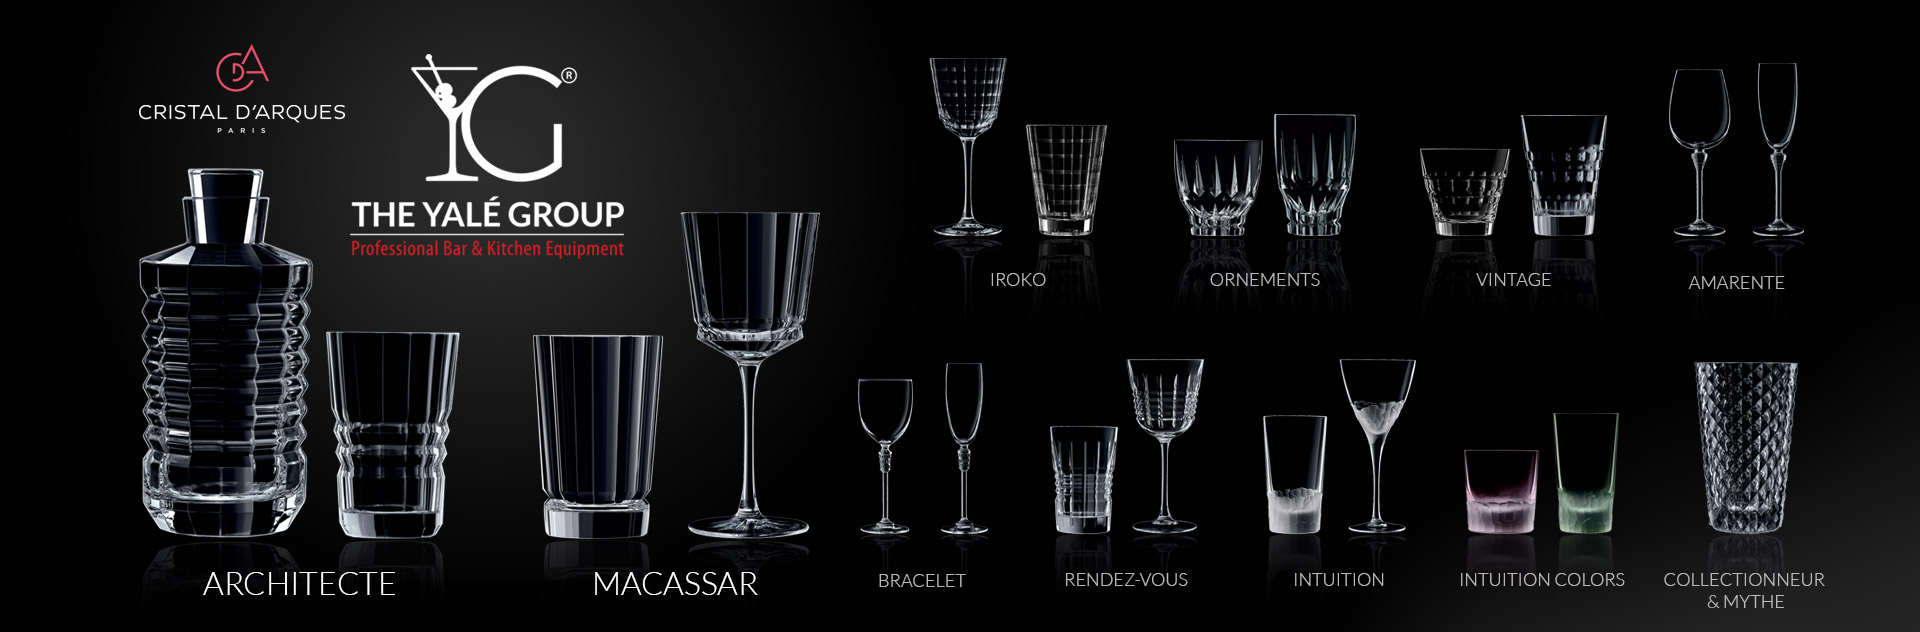 Architechte Glasses